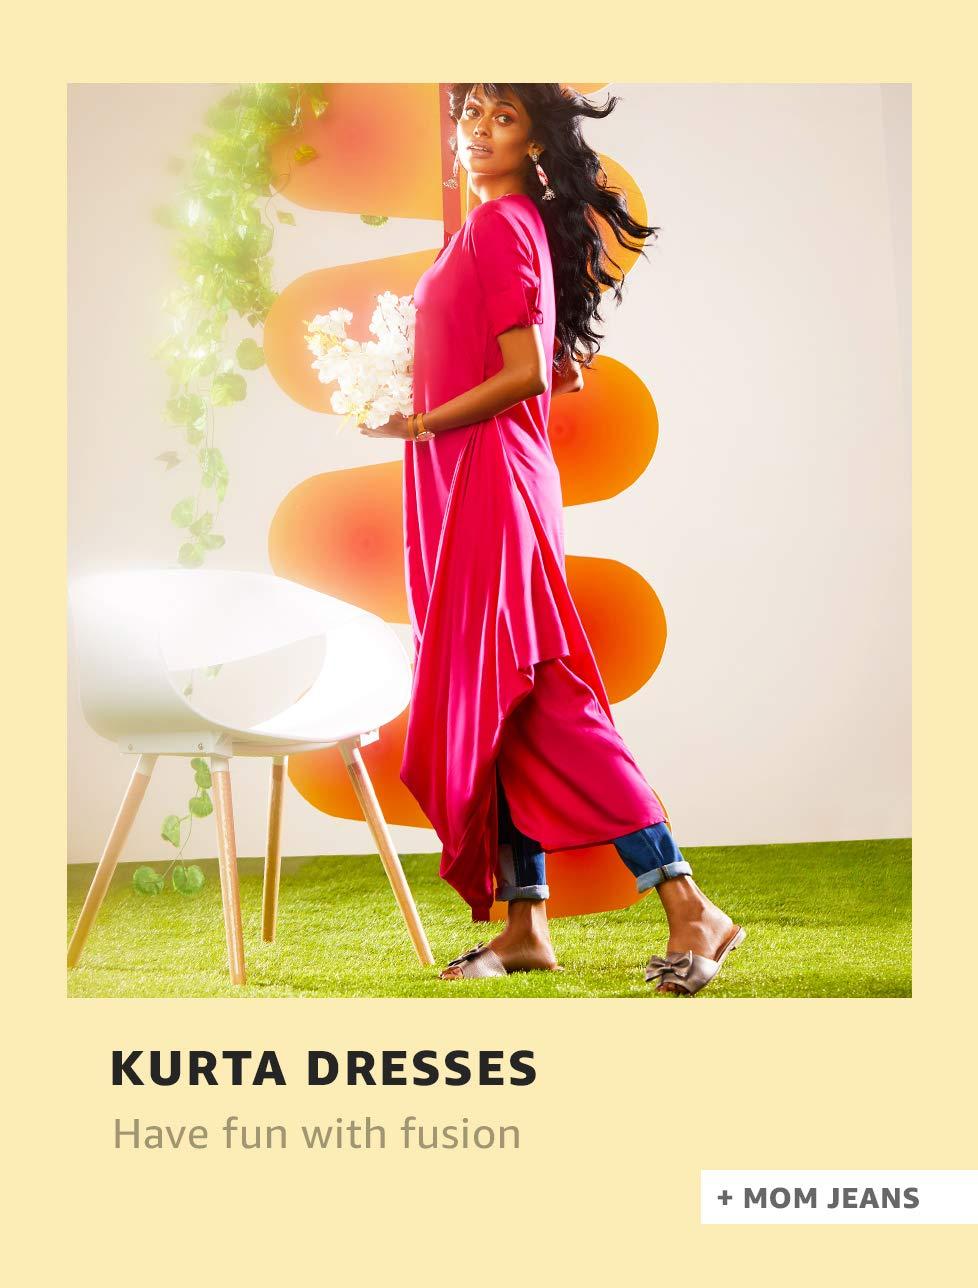 Kurta dresses